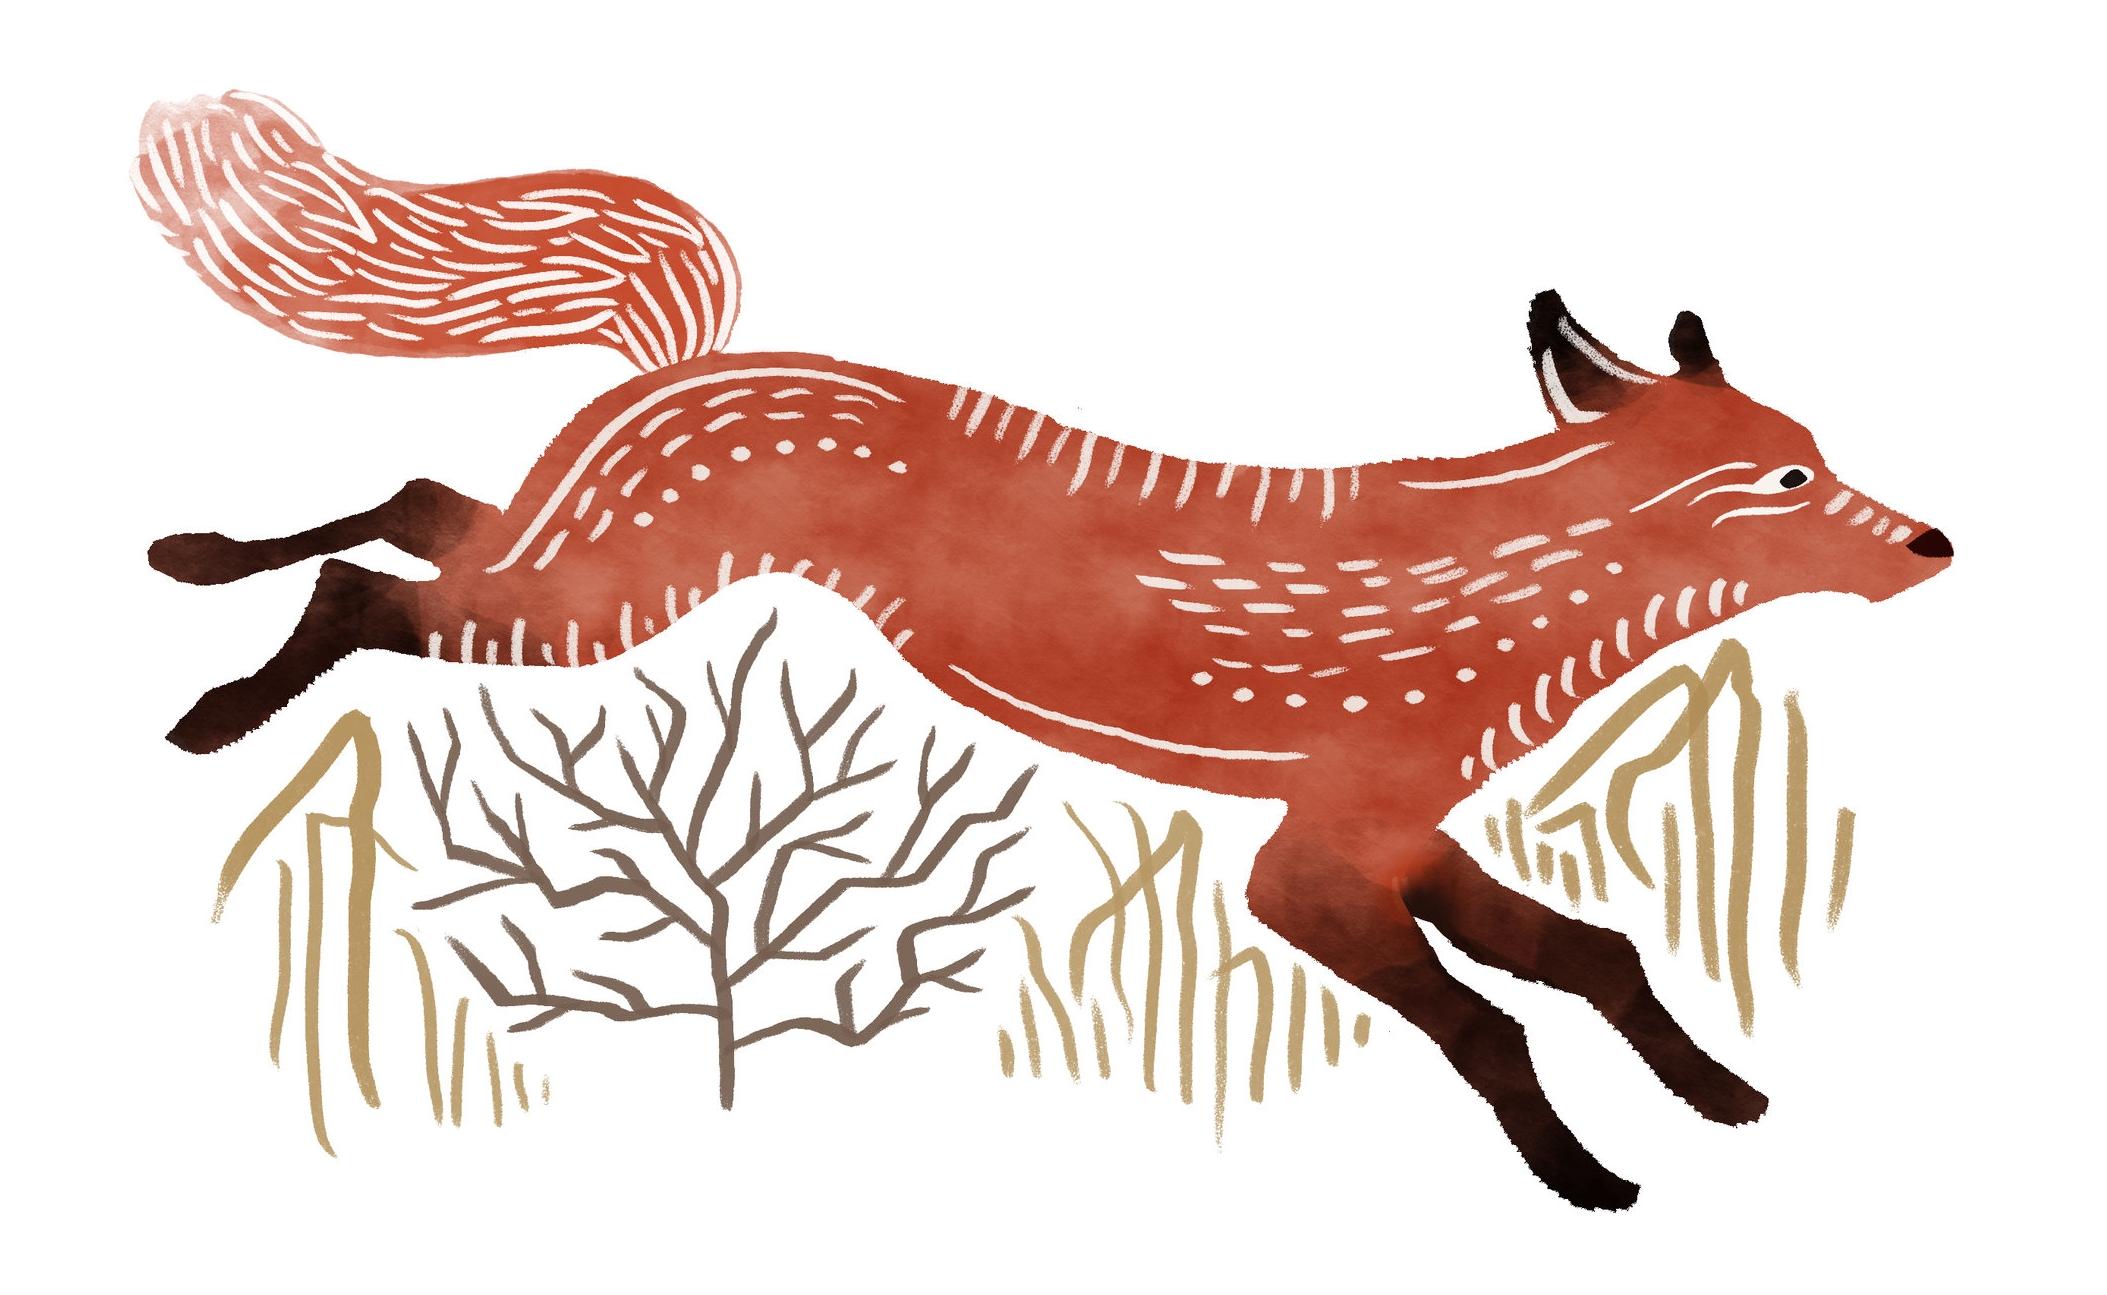 FOX-Revised_2.jpg